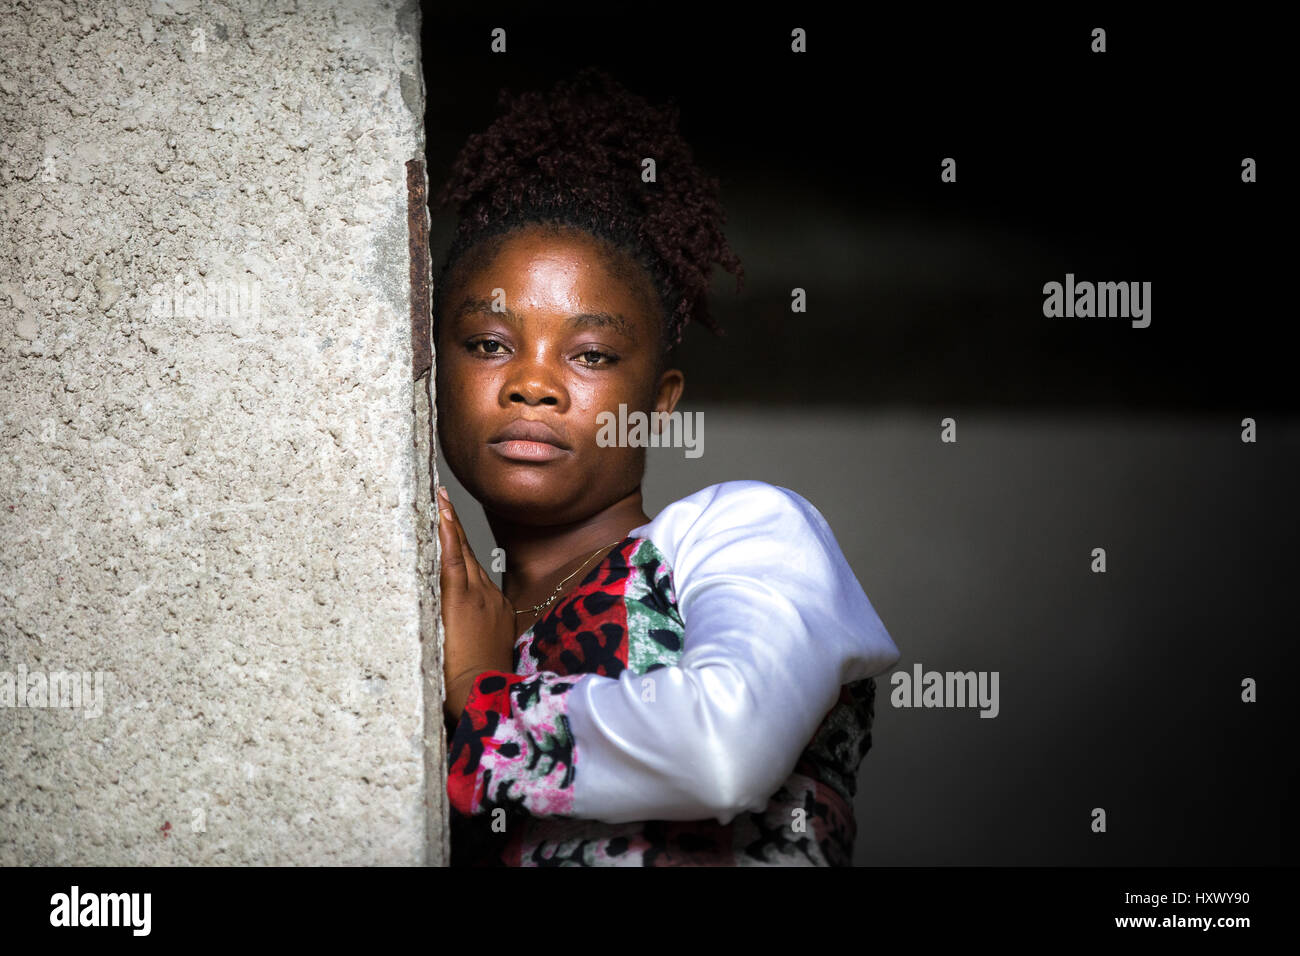 Portrait of Decontee Davies, Ebola survivor, Monrovia, Liberia - Stock Image